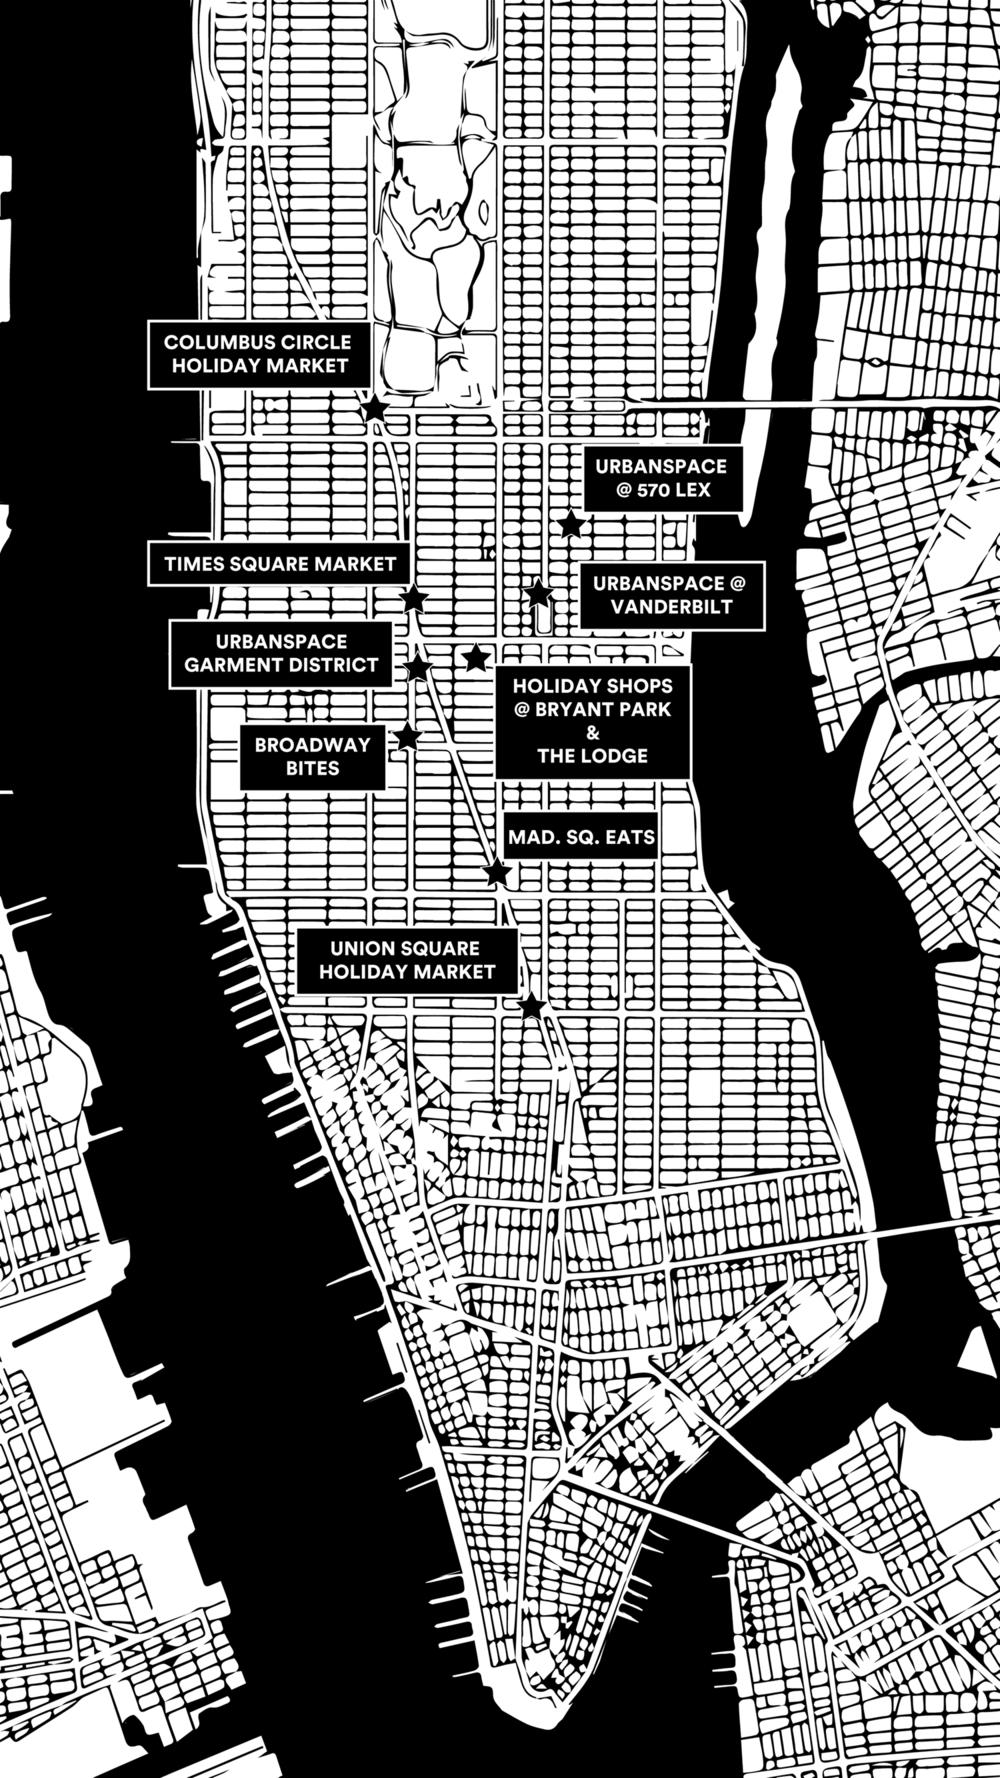 manhattan-grid-map bw-01.png